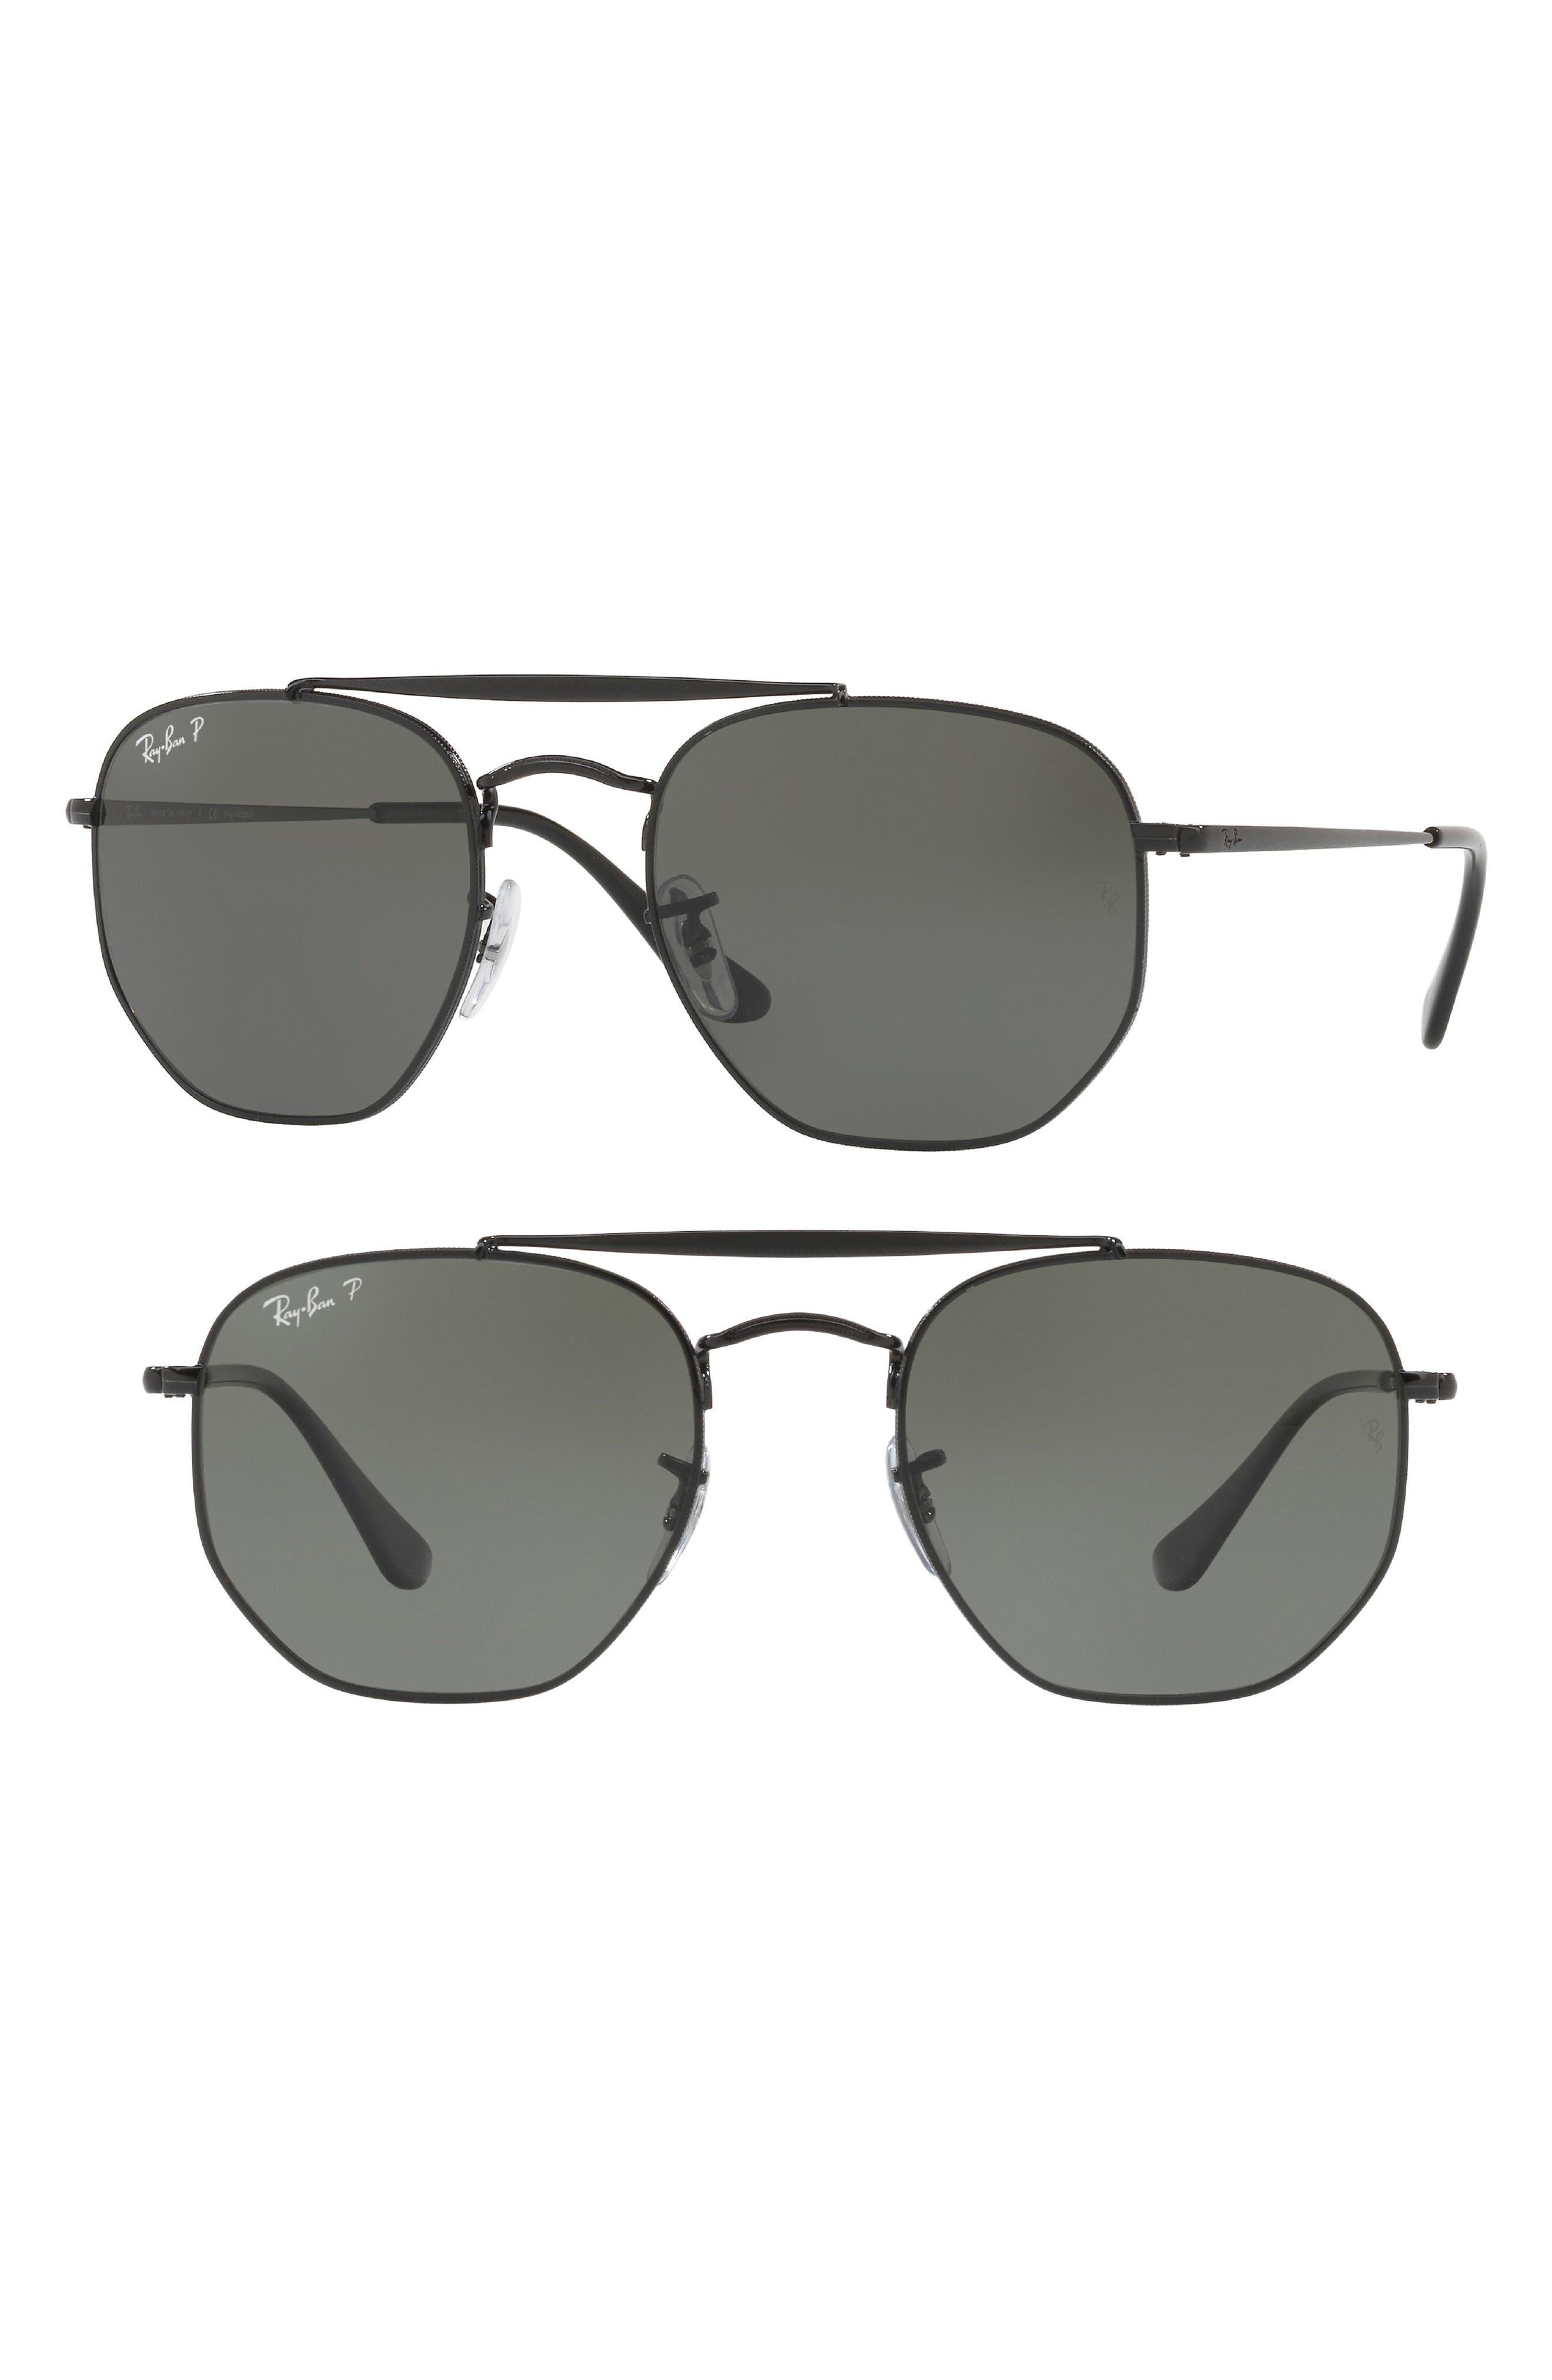 55mm Geometric Sunglasses,                         Main,                         color, 002